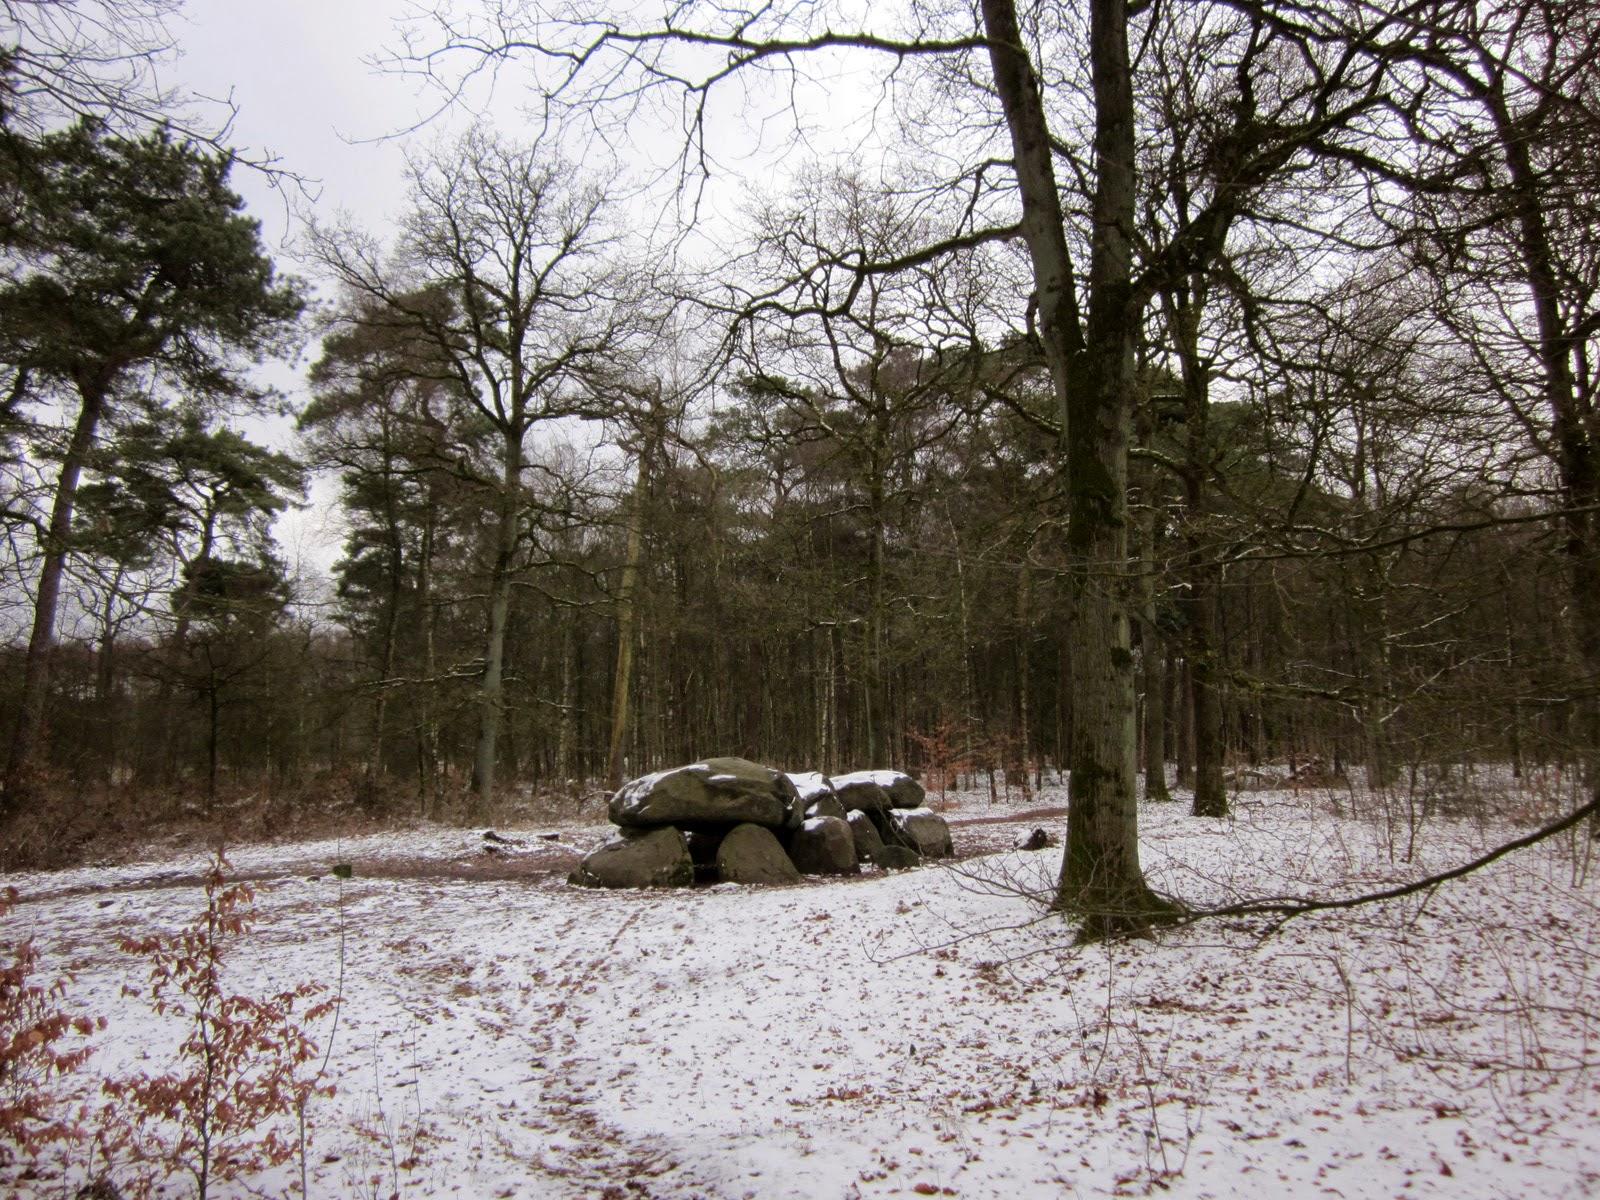 File:Hunebed (dolmen) d8, Anloo, Drenthe, Netherlands - panoramio (